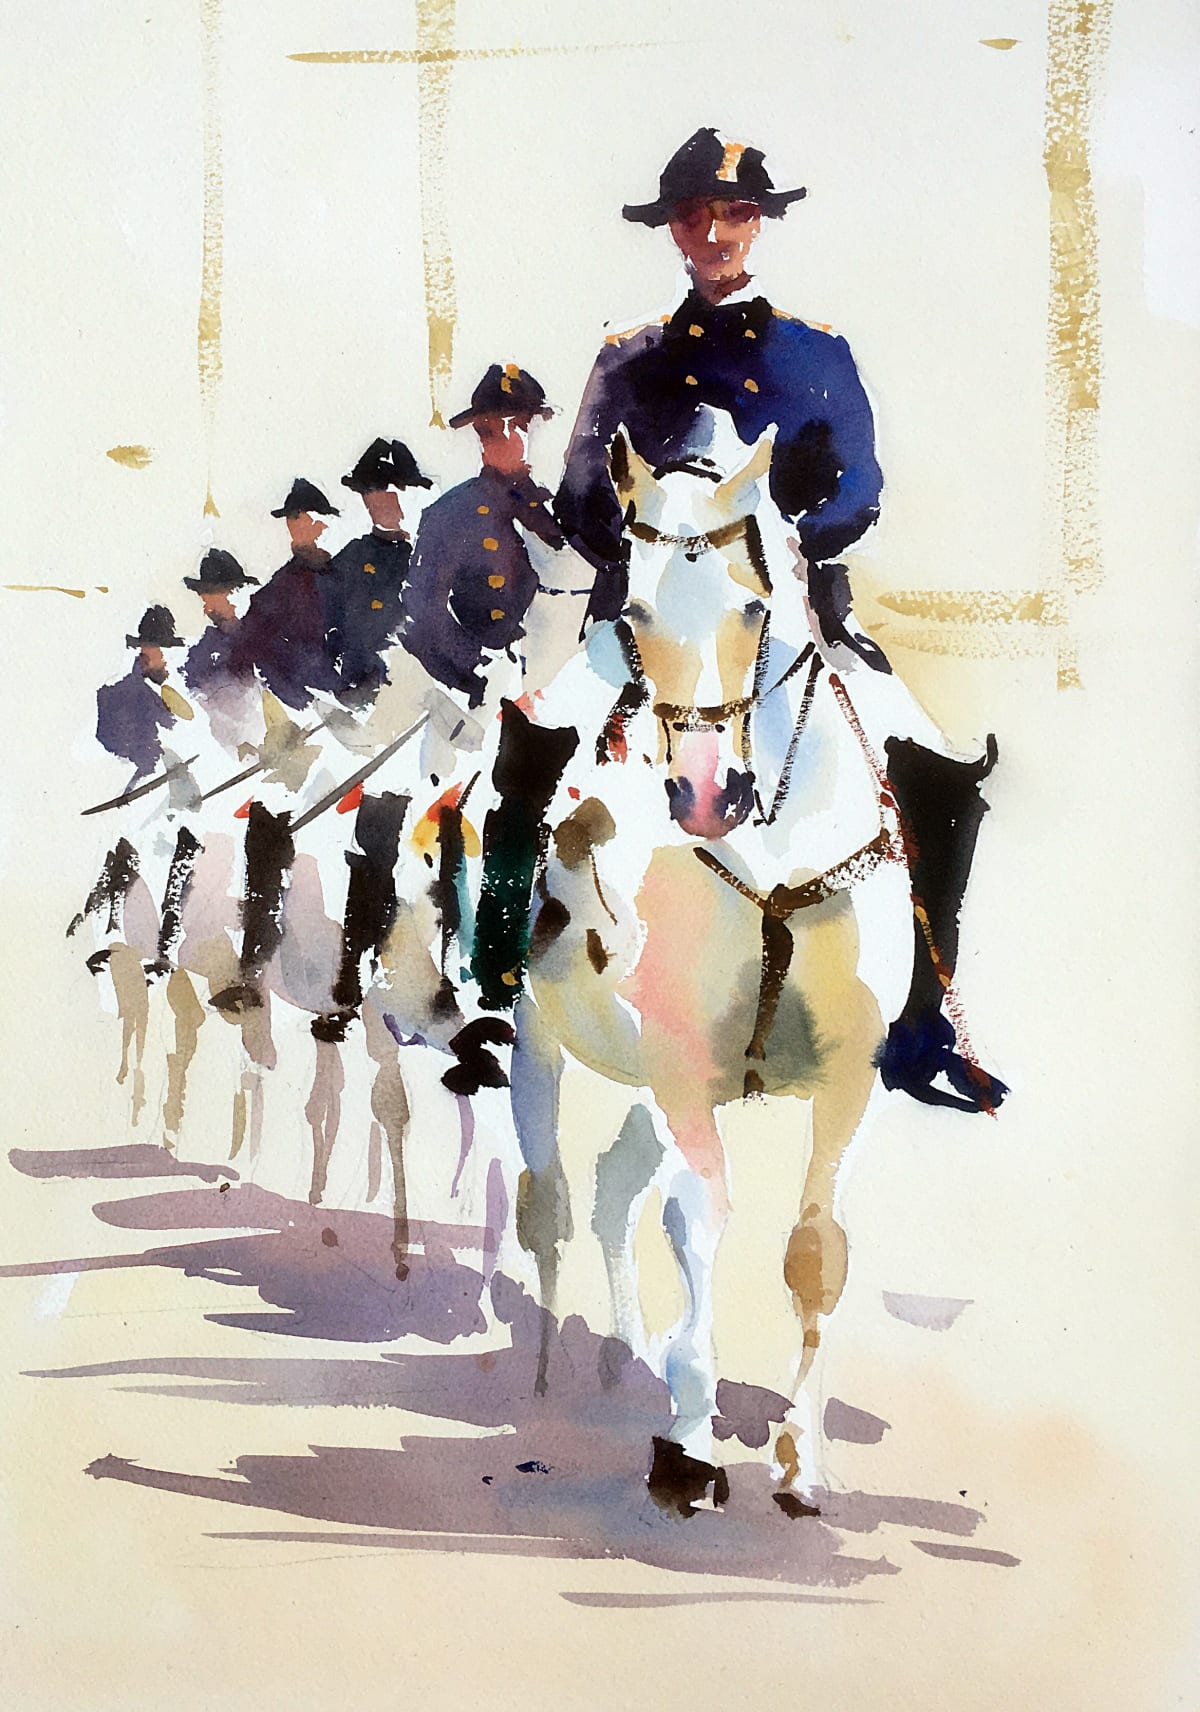 Jake Winkle LIPPIZANER LINE OUT Watercolour 18 x 13 in. 45.72 x 33.02 cm